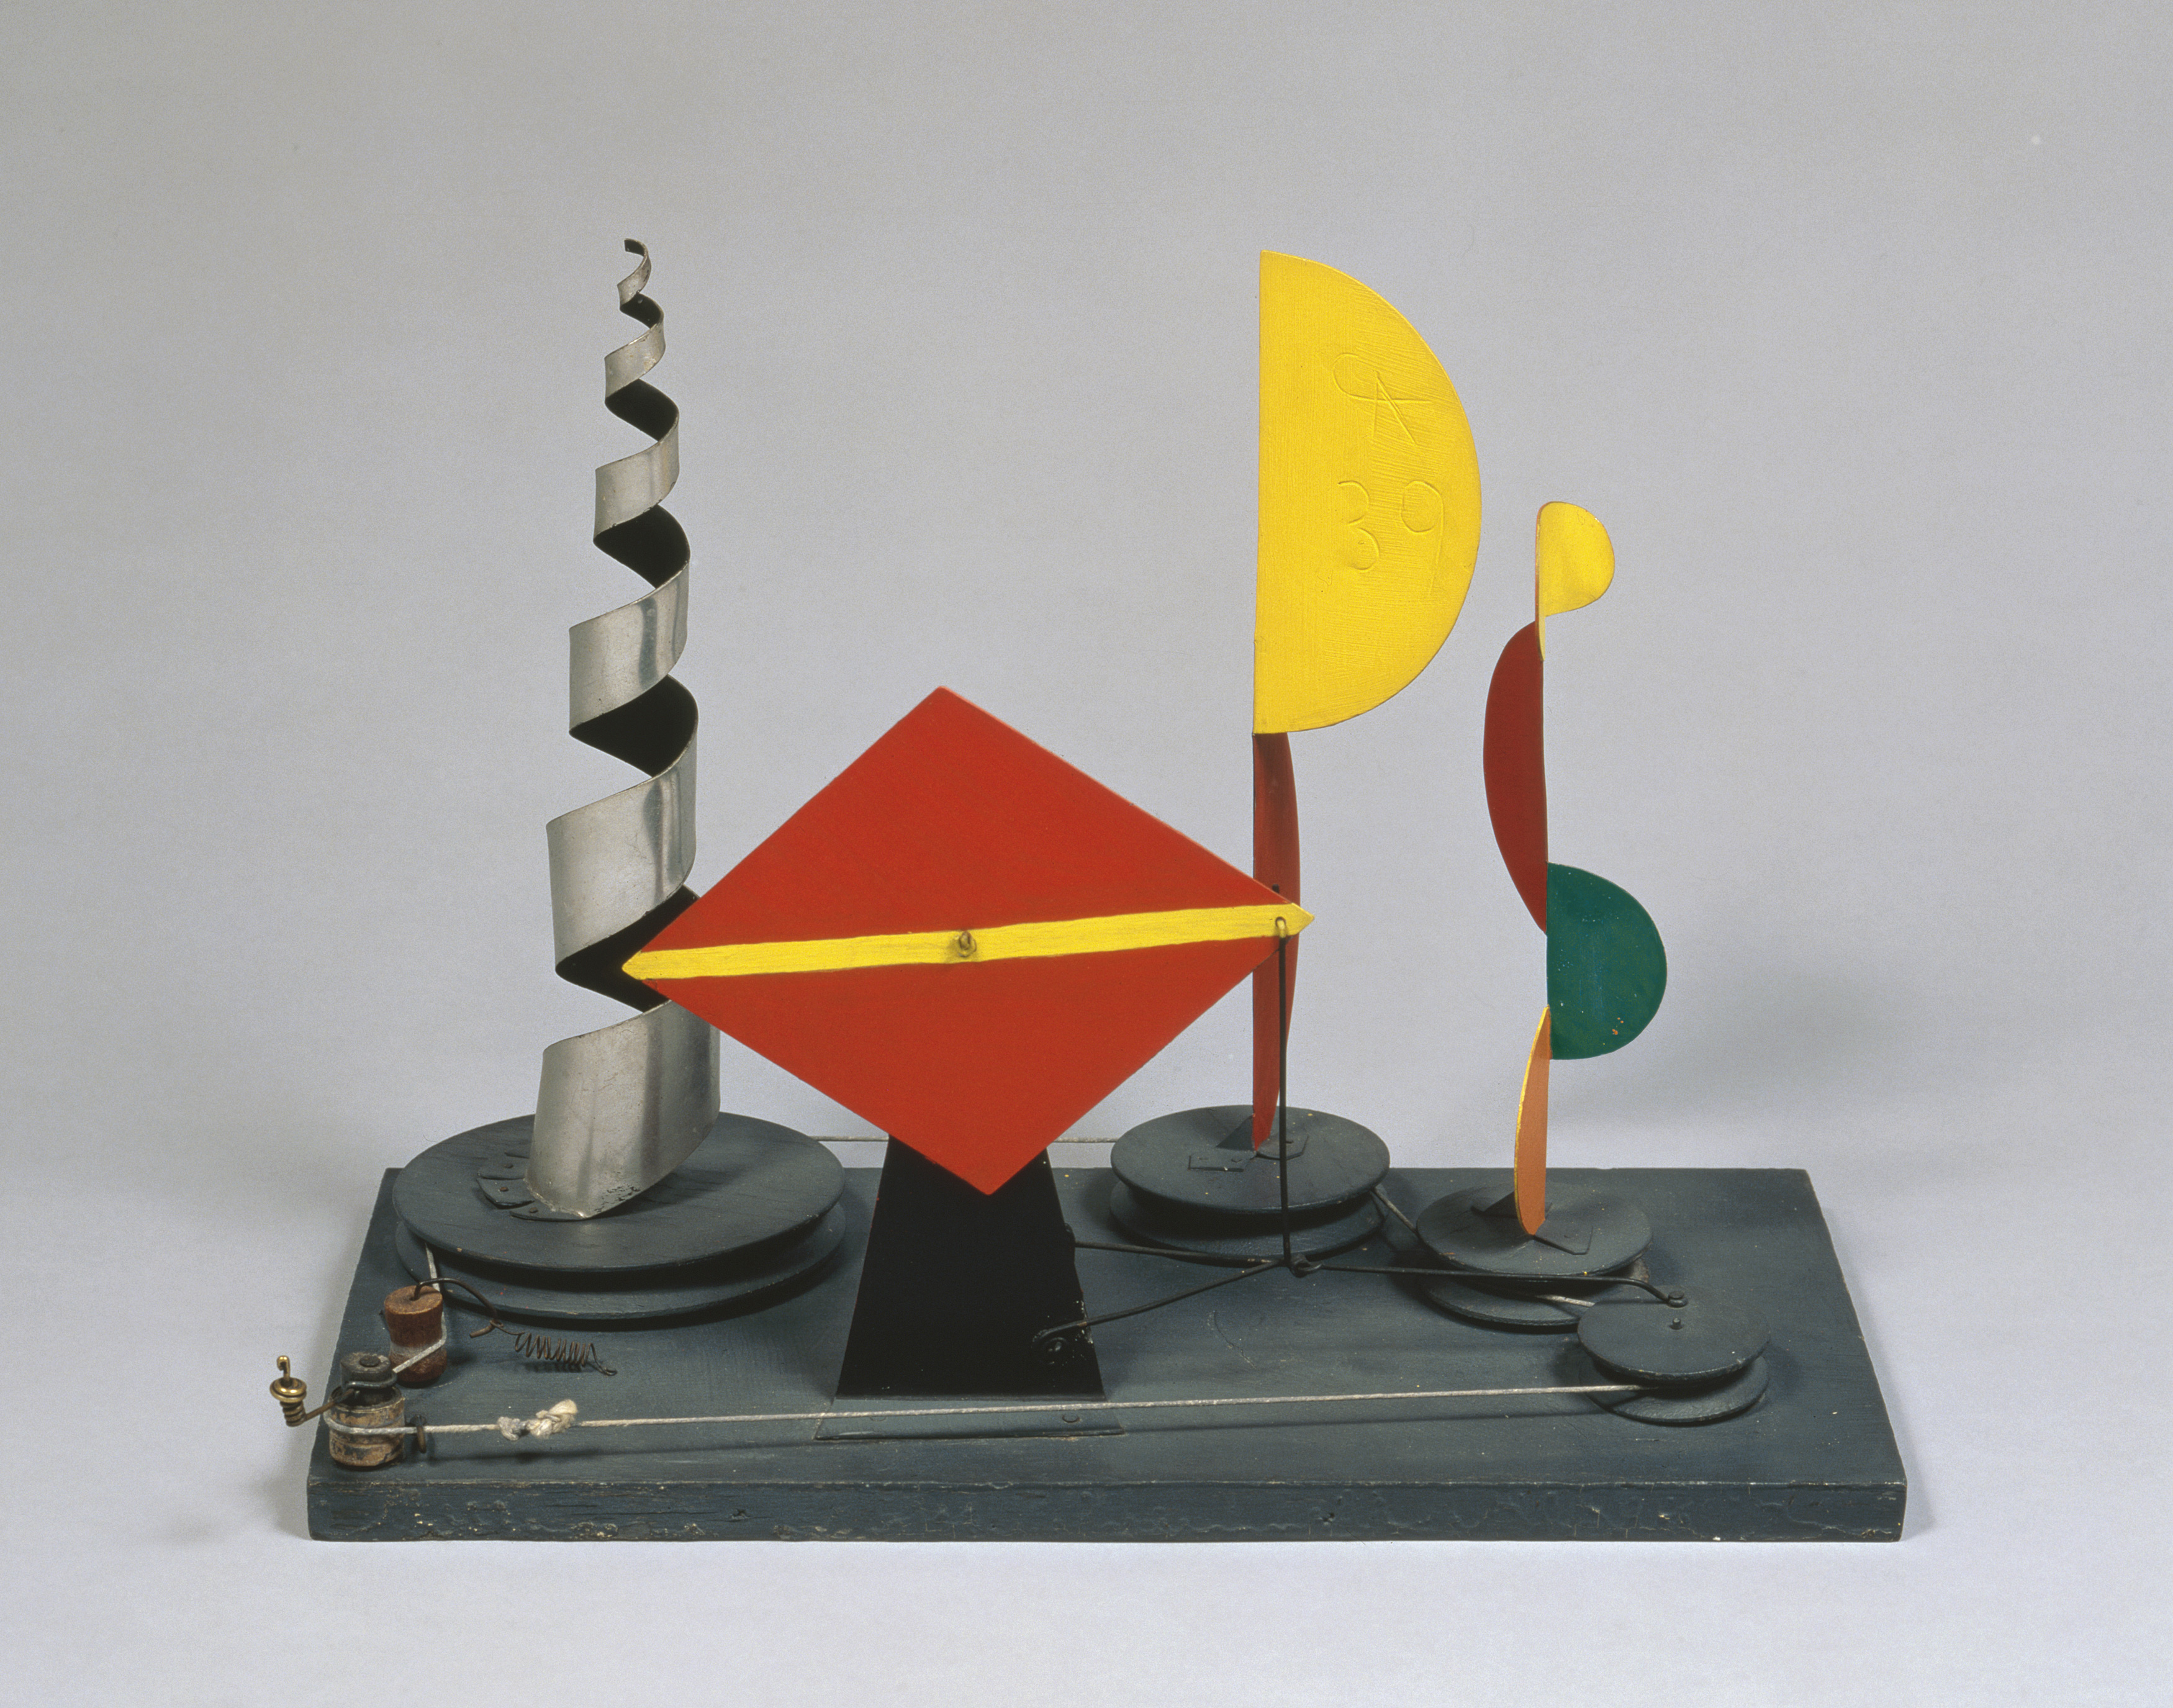 Alexander Calder. Untitled (maquette for 1939 New York World's Fair), 1938. © 2019 Calder Foundation, New York / VEGAP, Santander